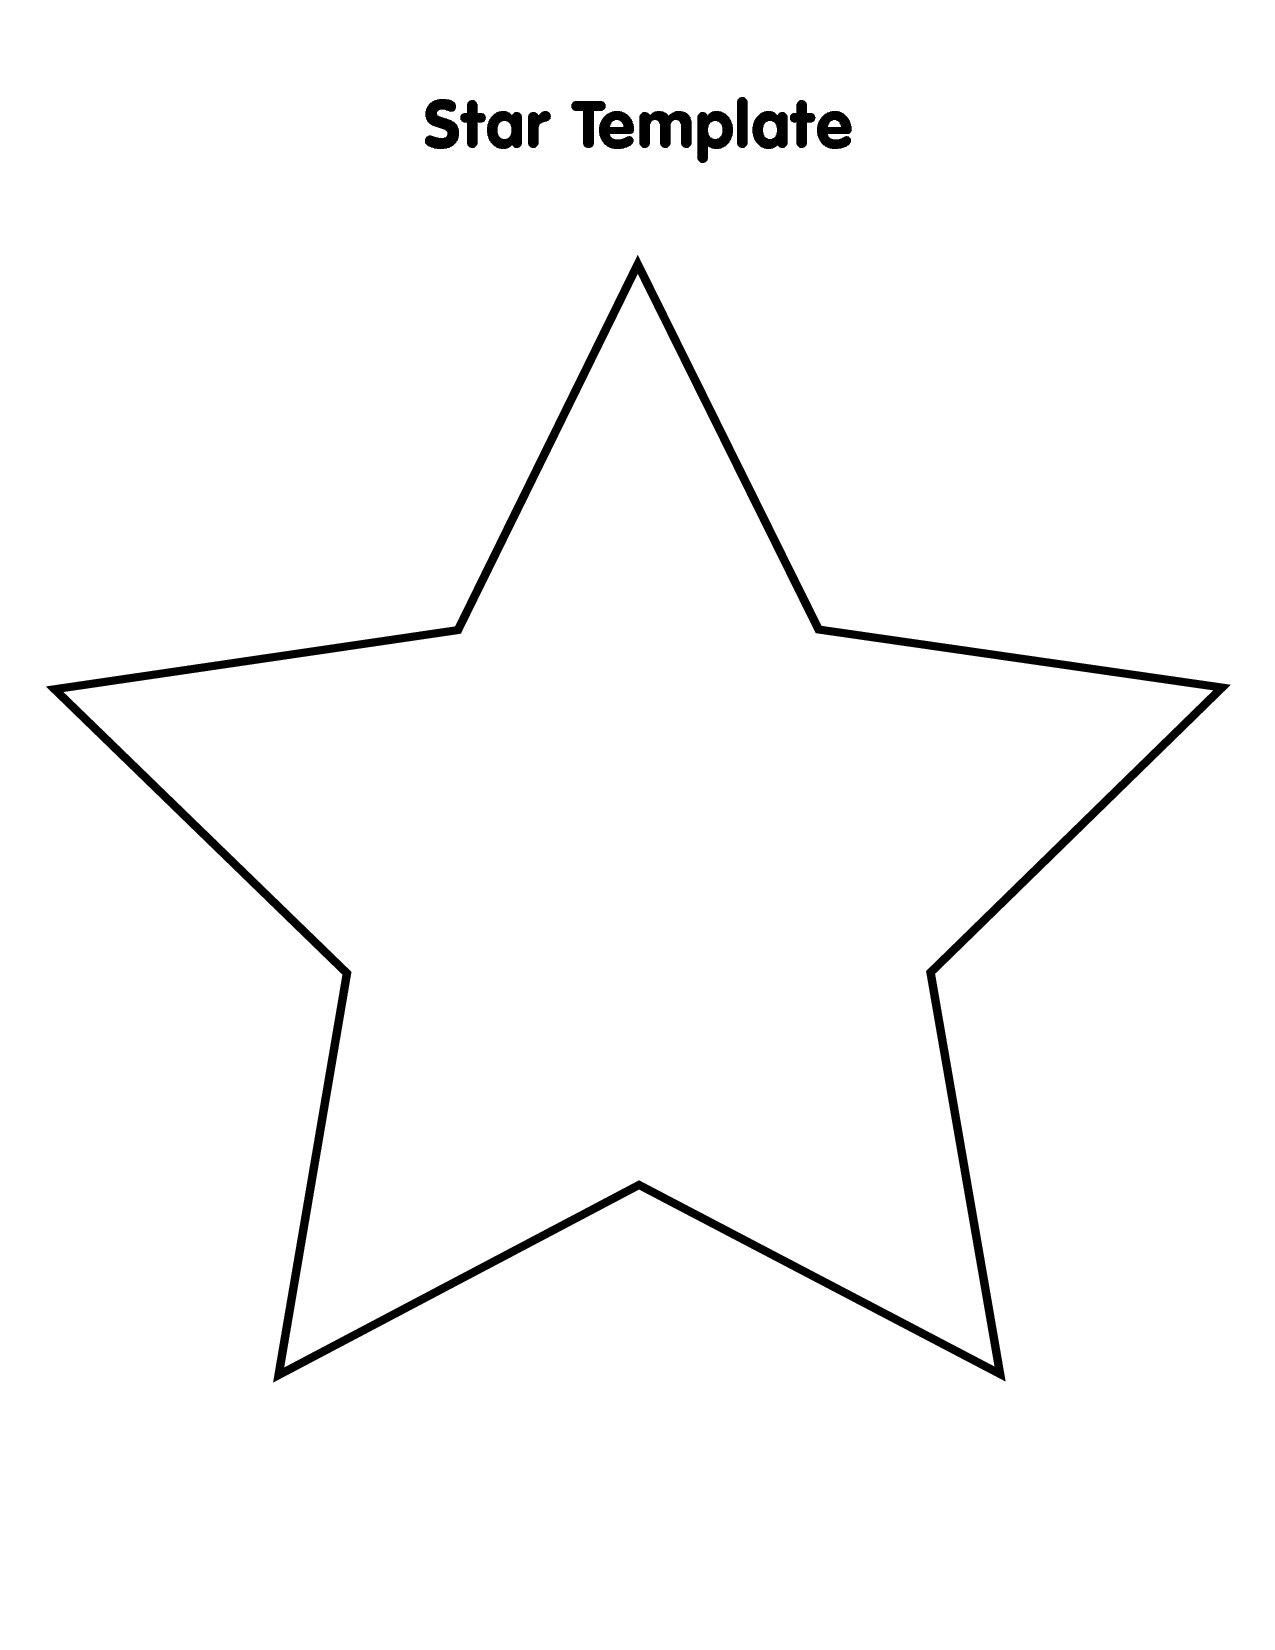 star template free printable star template 7 inch tim39s printables printable star free template